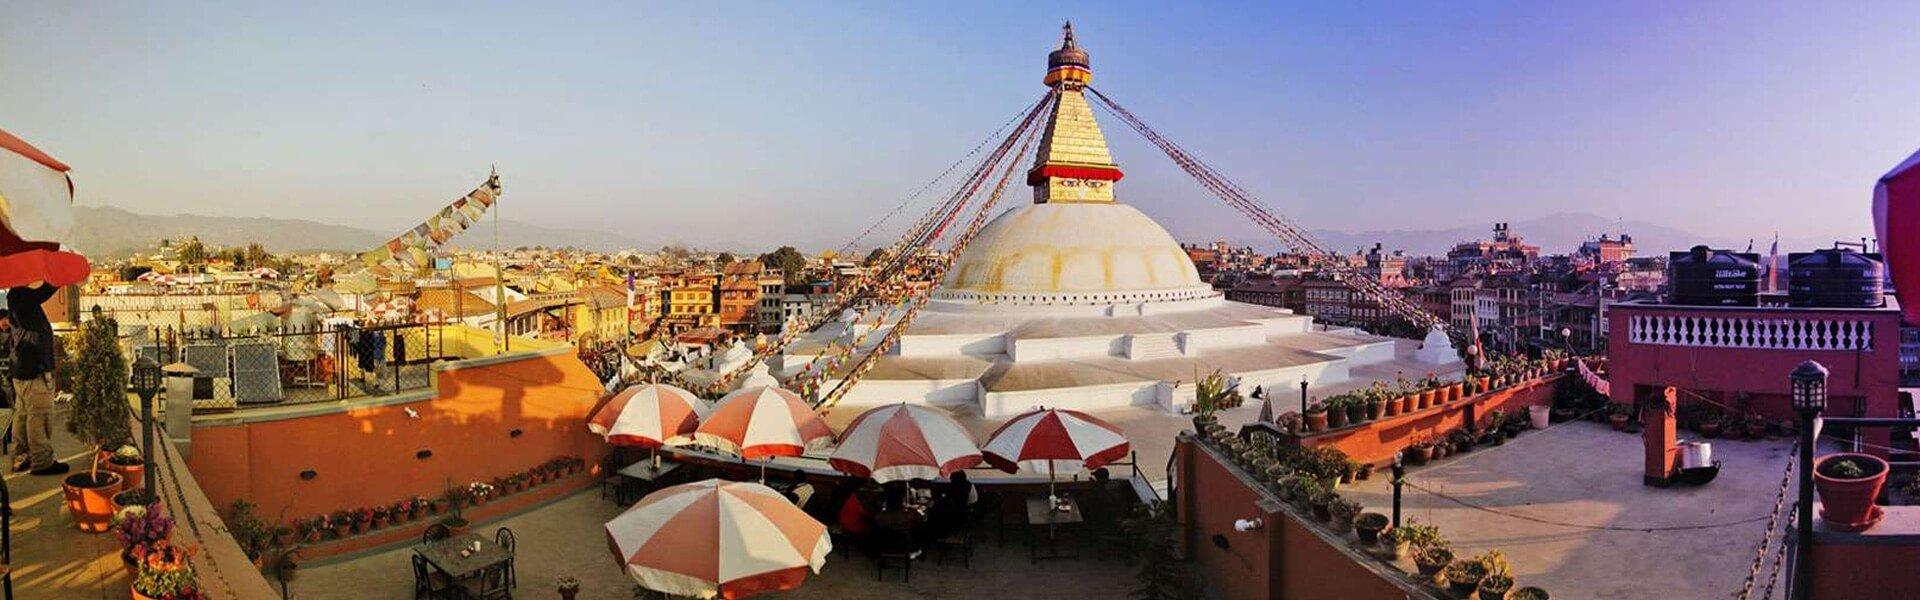 Trekking and adventure destinations in Nepal